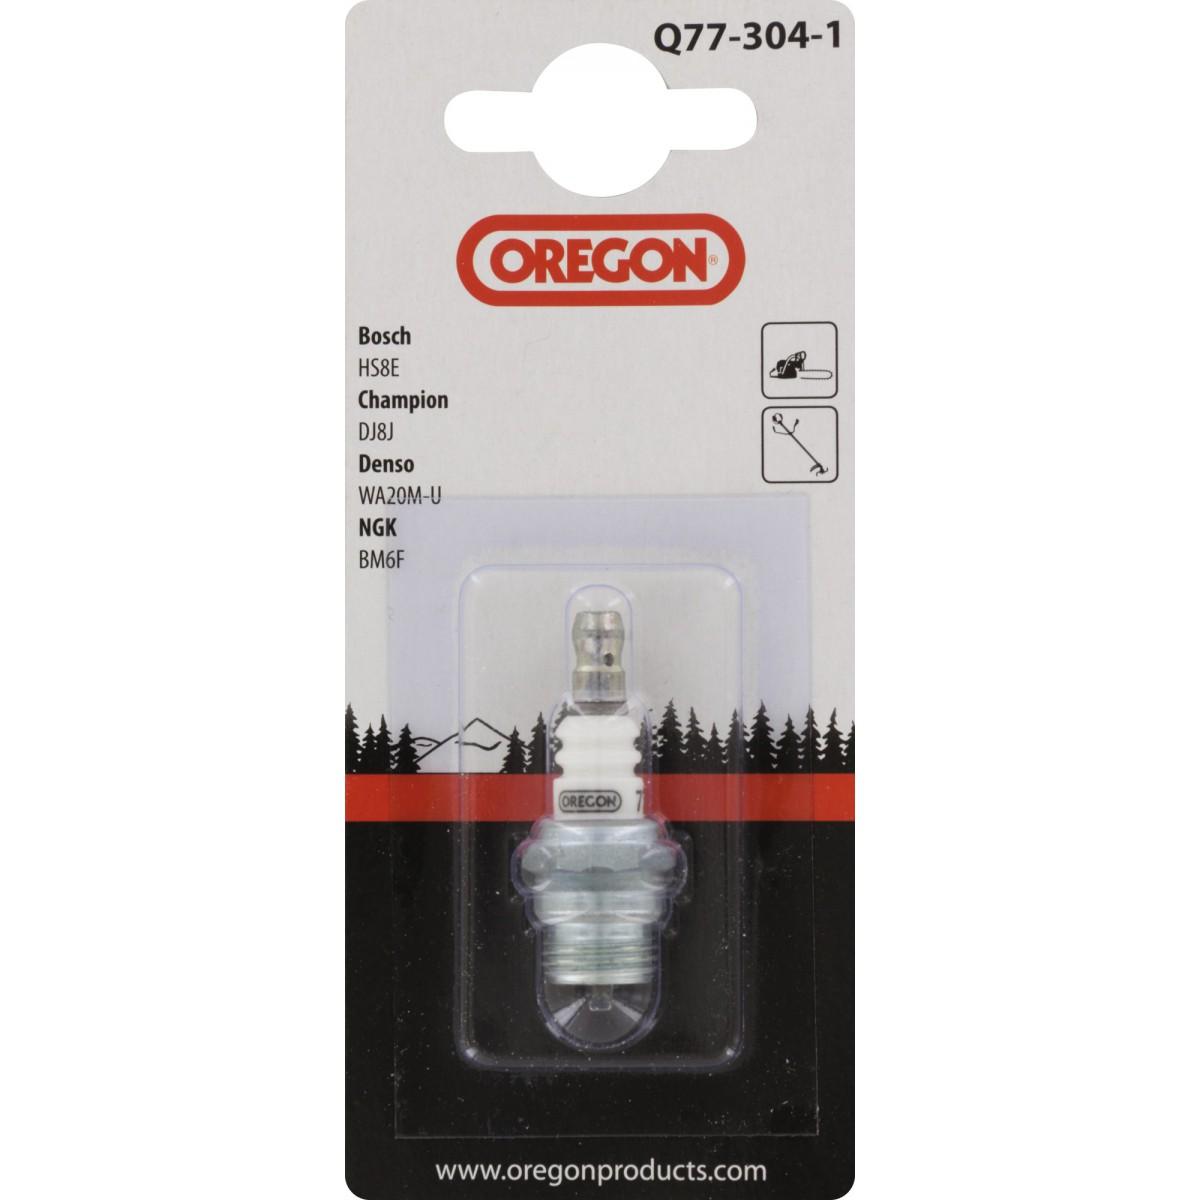 Bougie d'allumage Oregon - Q77-304-1